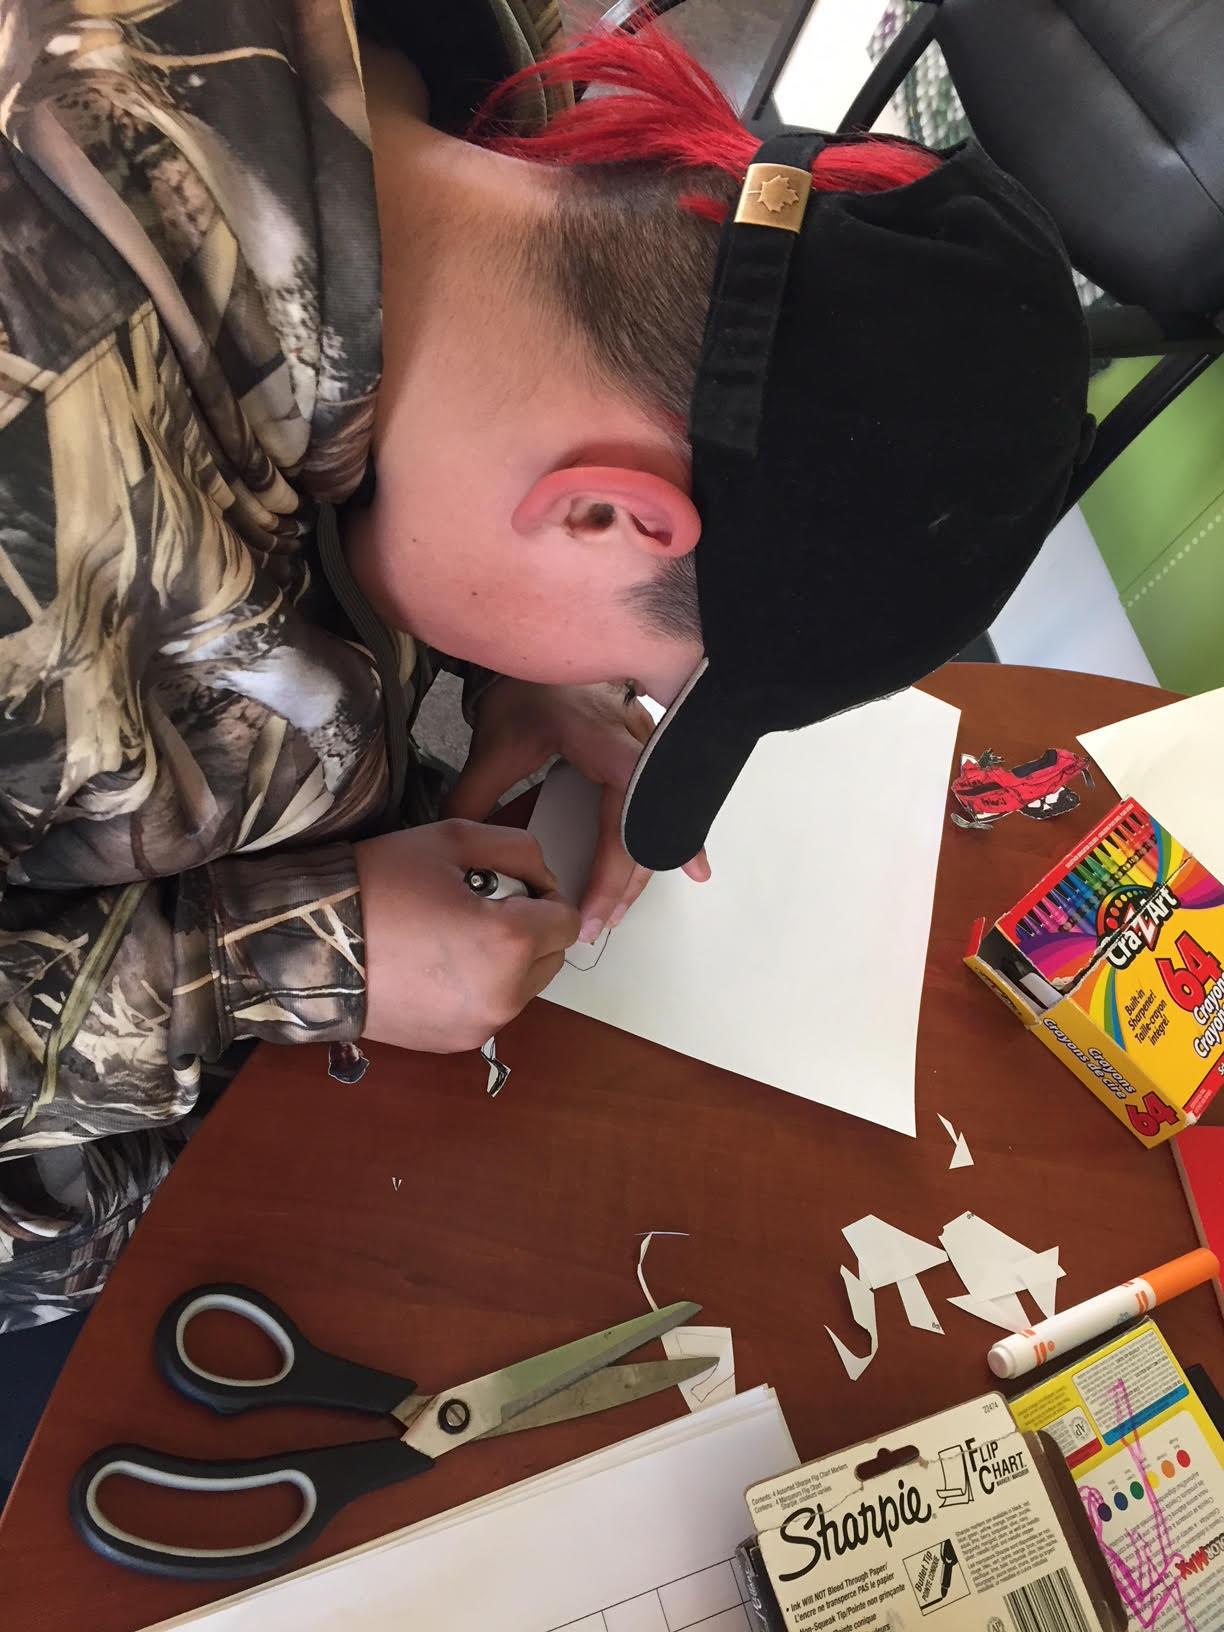 Dean creates artwork for A&D productions